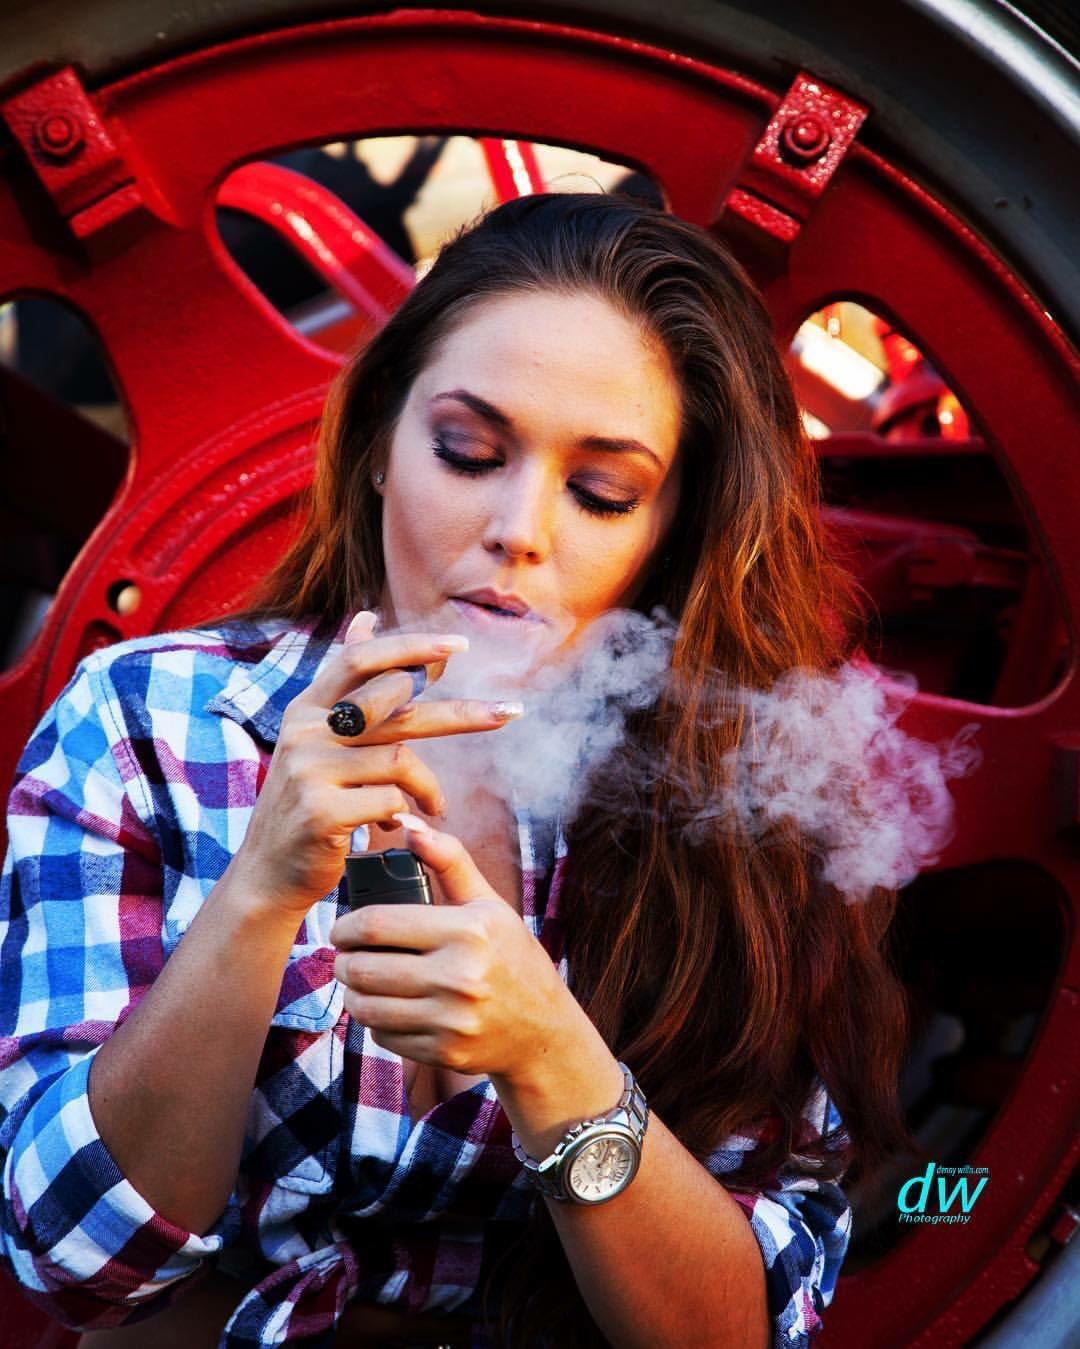 Kuwait girls smoking nude carrie cash